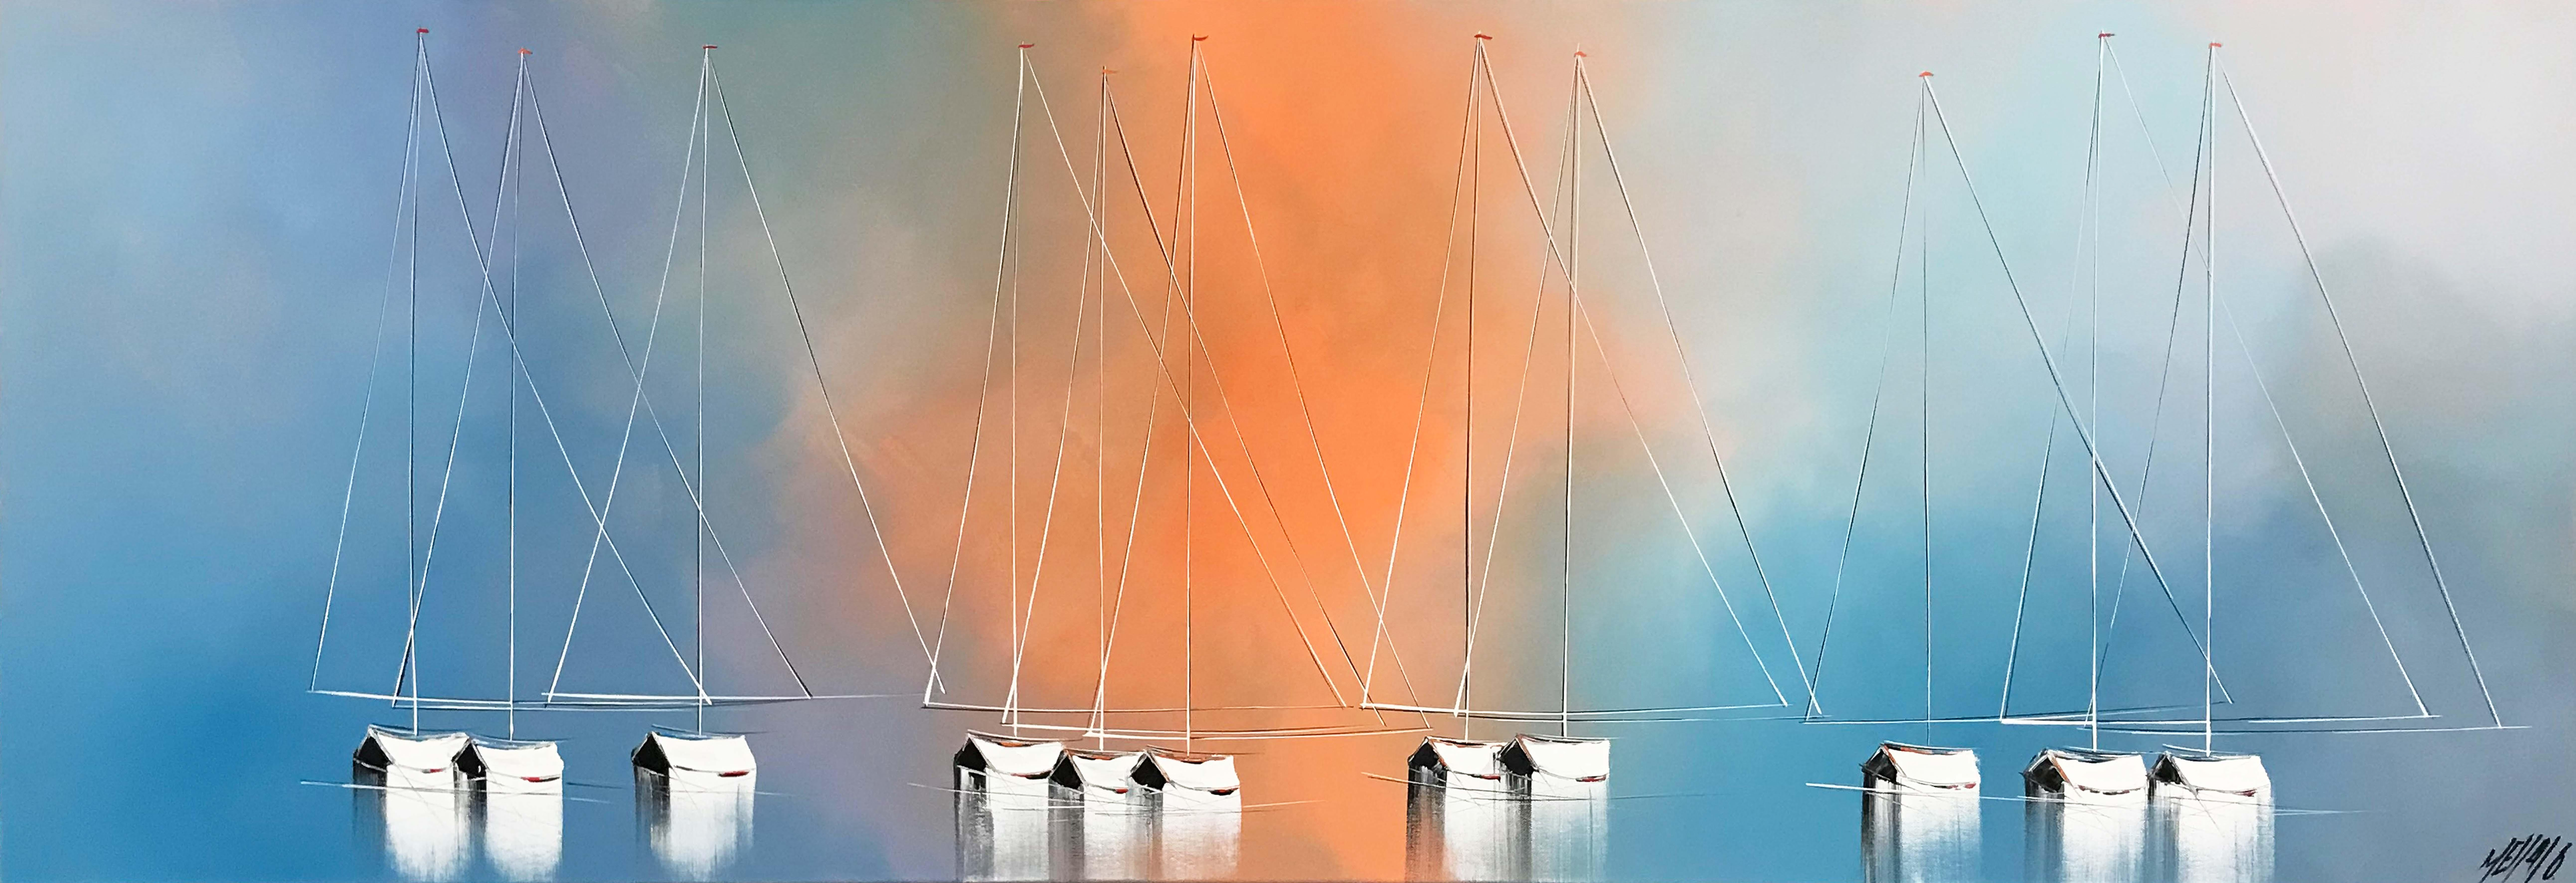 Silence en mer... | 60x175cm